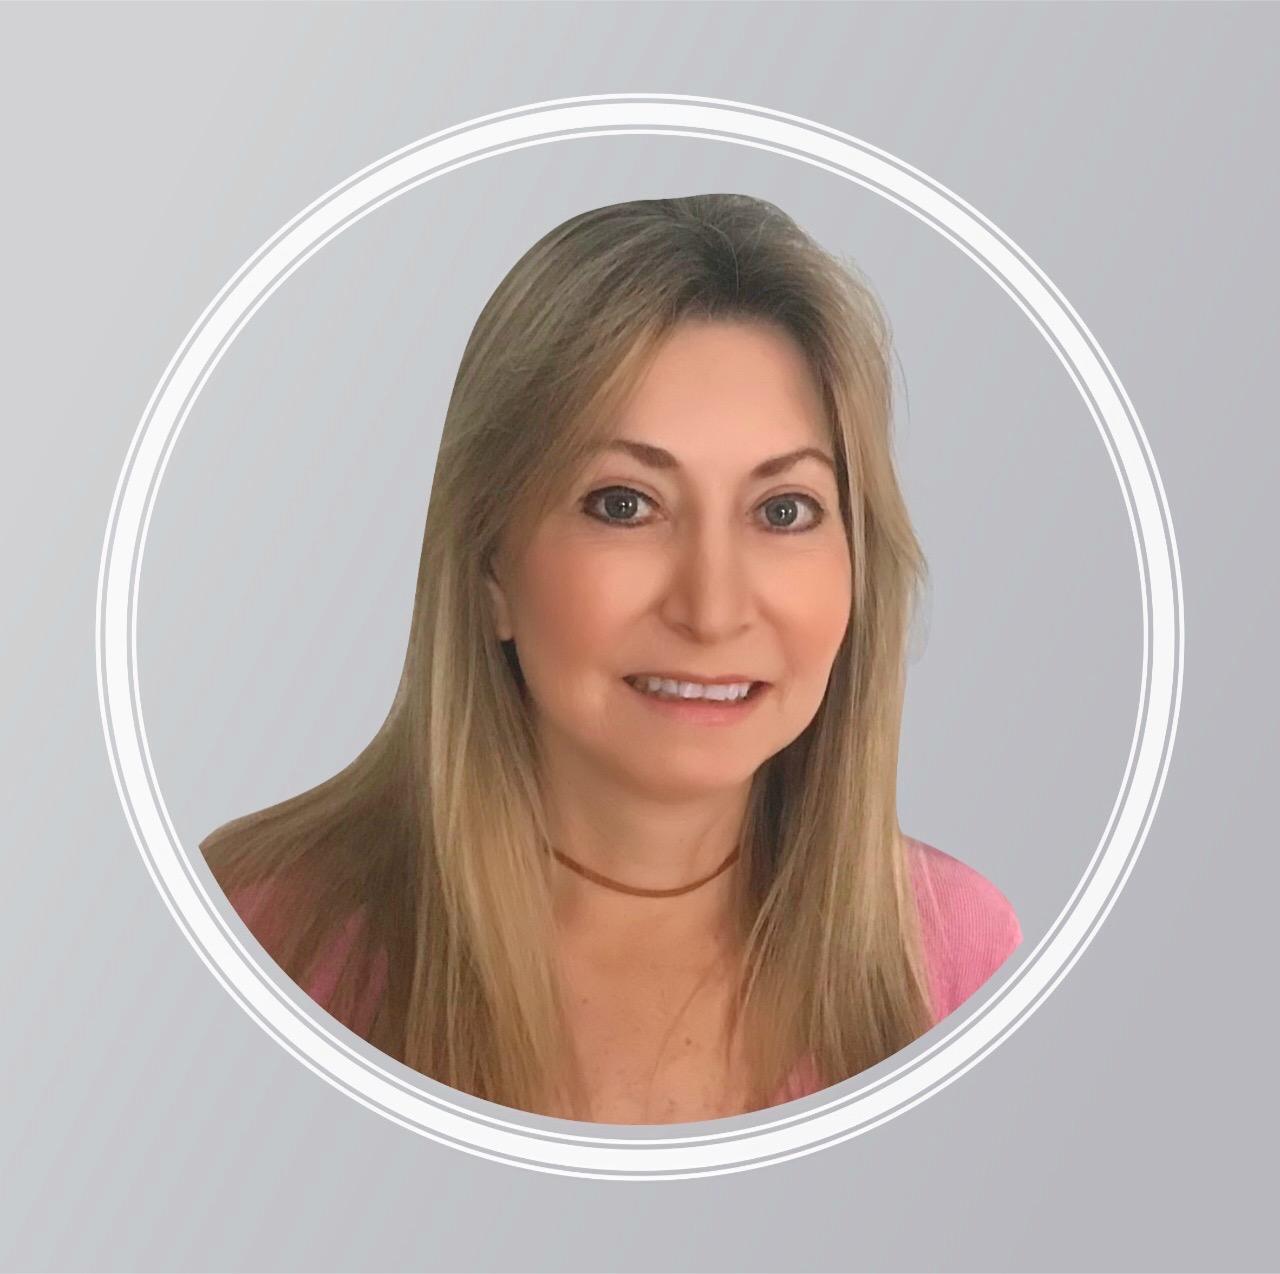 Cristina Aoun